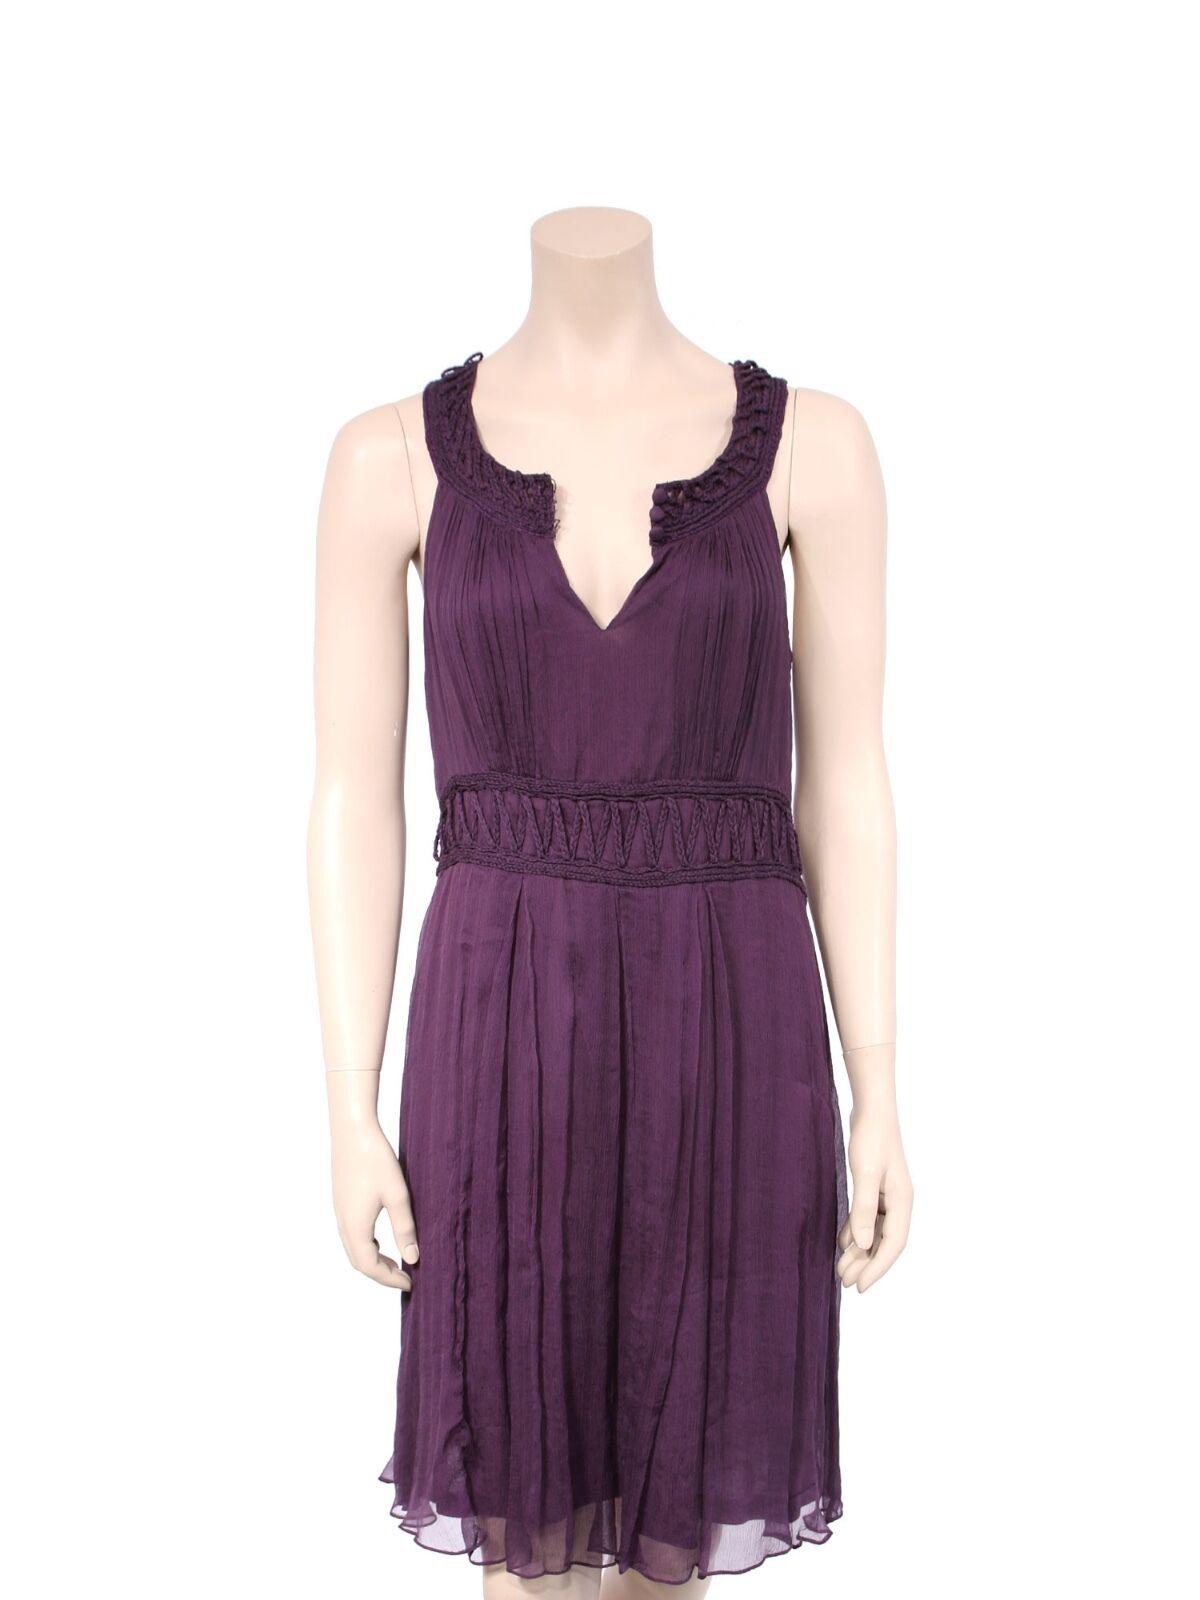 CYNTHIA STEFFE Silk Silk Silk Crochet Detail Dress (SIZE L) 692399